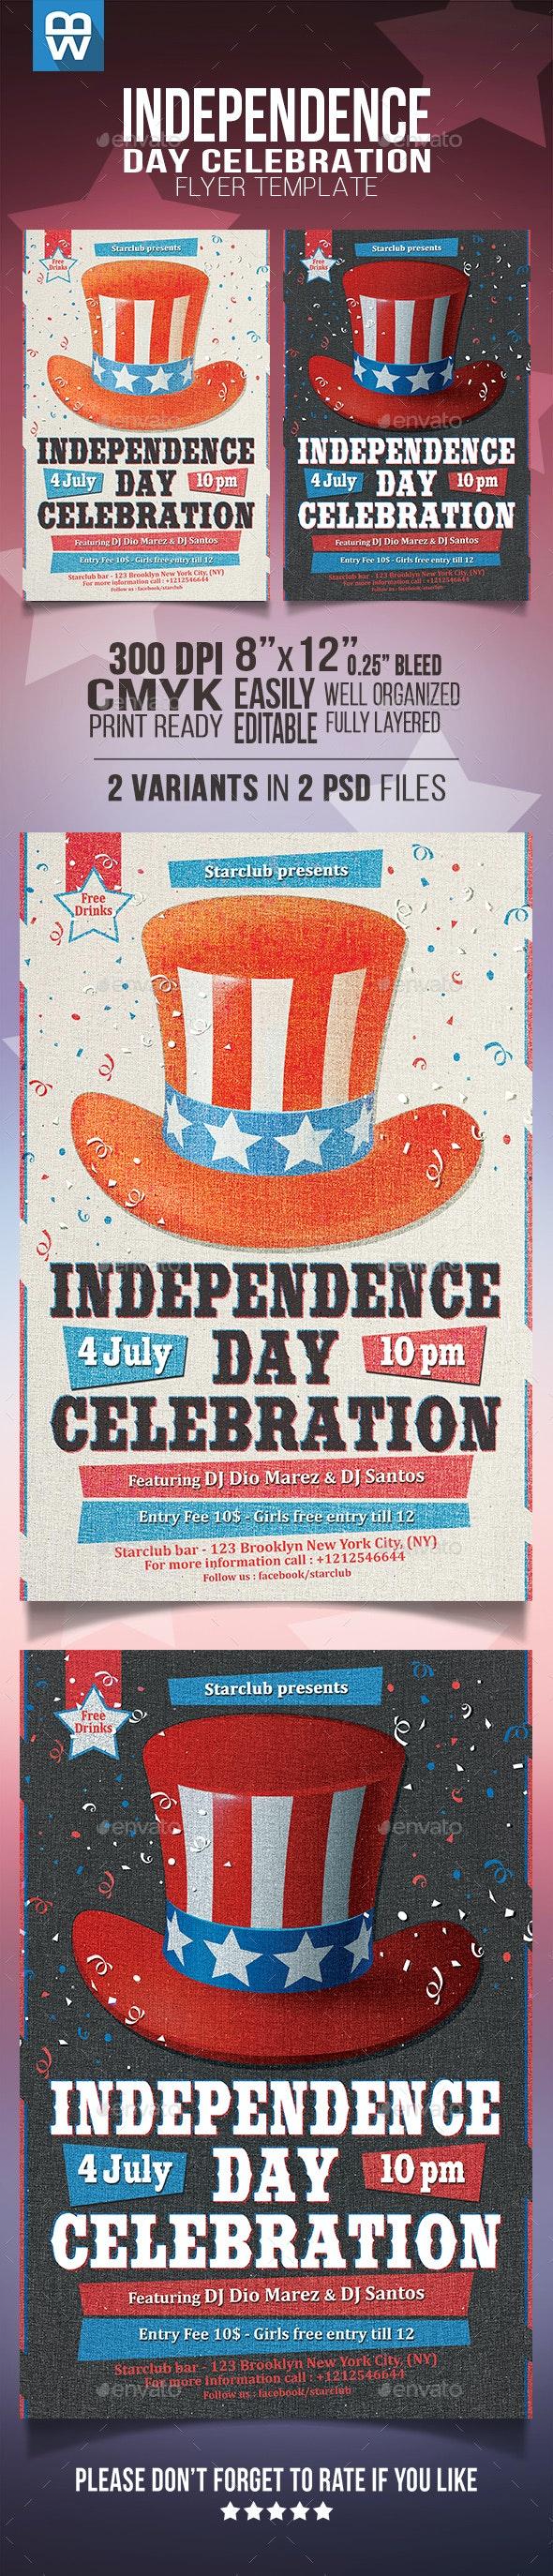 Independence Day Celebration Flyer - Events Flyers